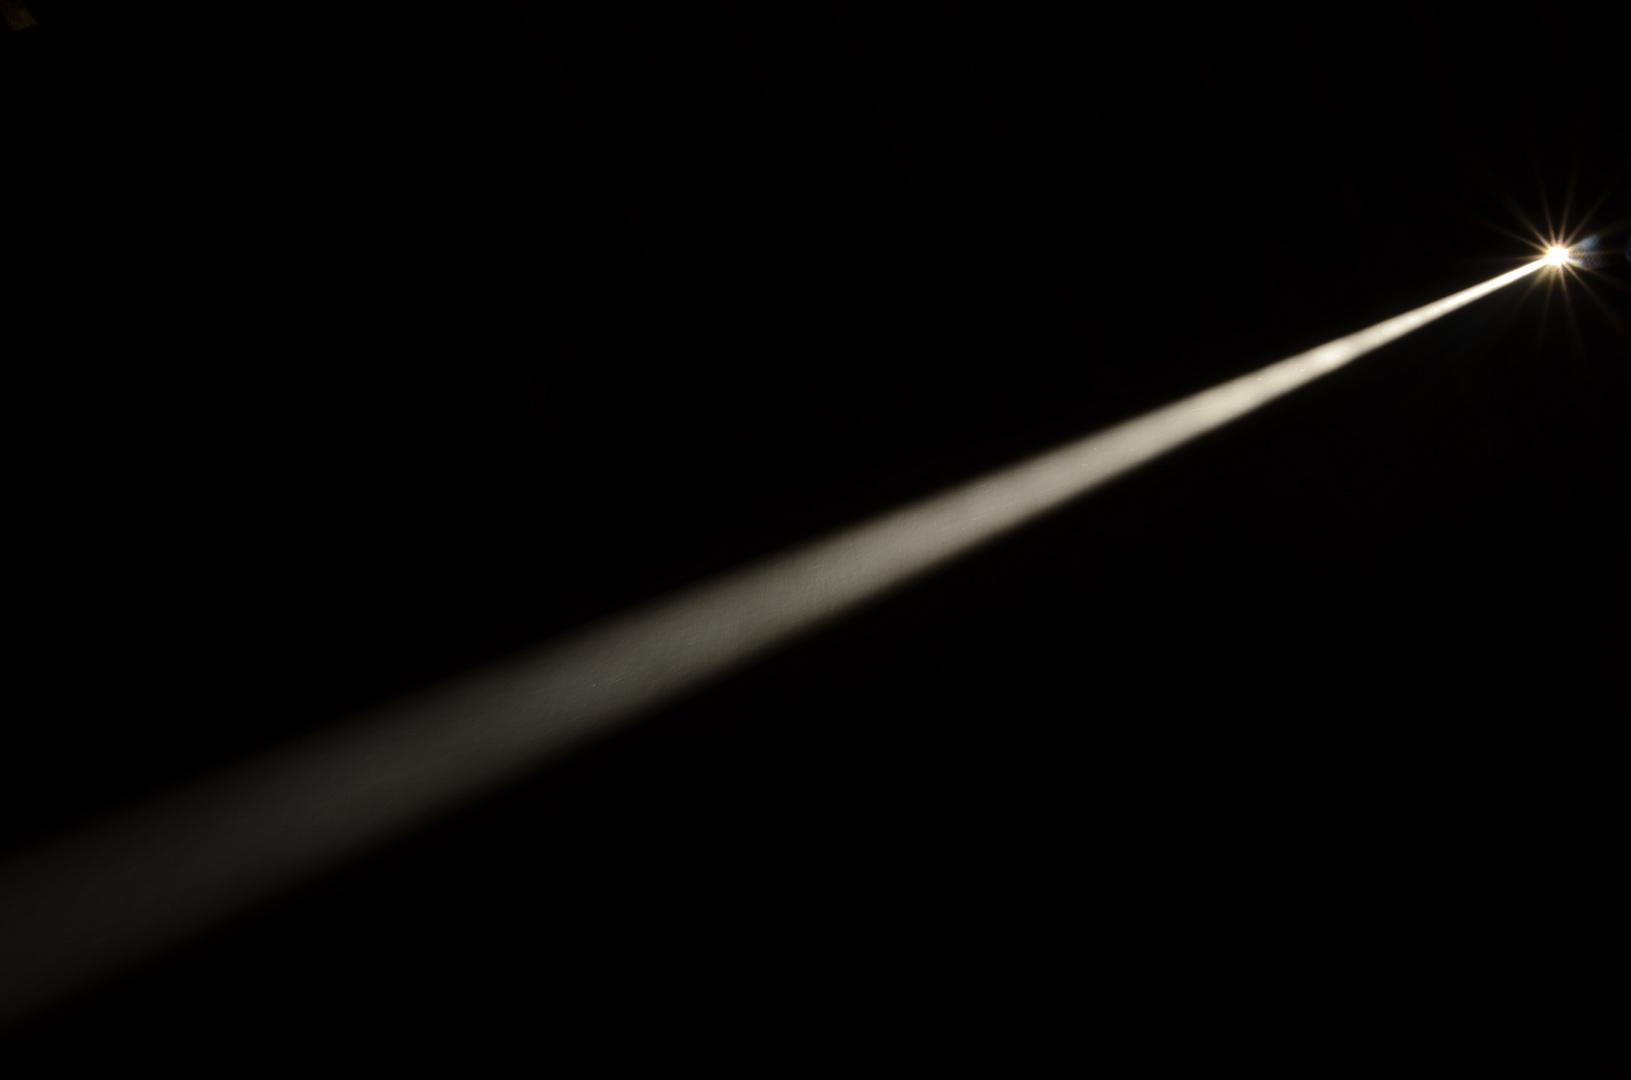 Un rayo de luz.